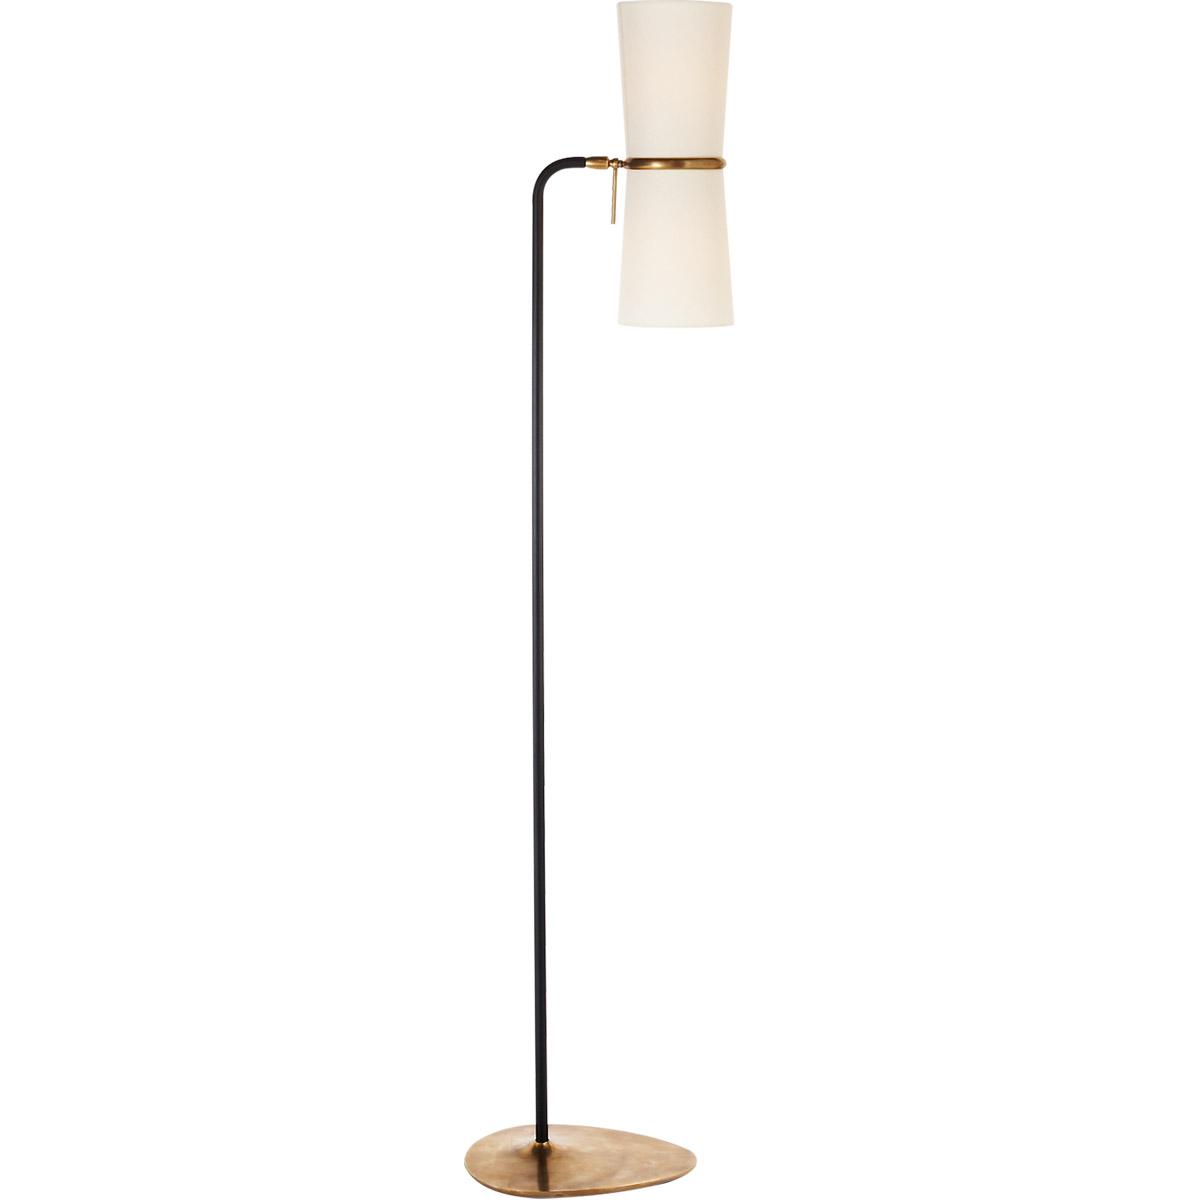 Picture of: Visual Comfort Arn1003blk L Aerin Clarkson 58 Inch 40 Watt Black And Brass Floor Lamp Portable Light